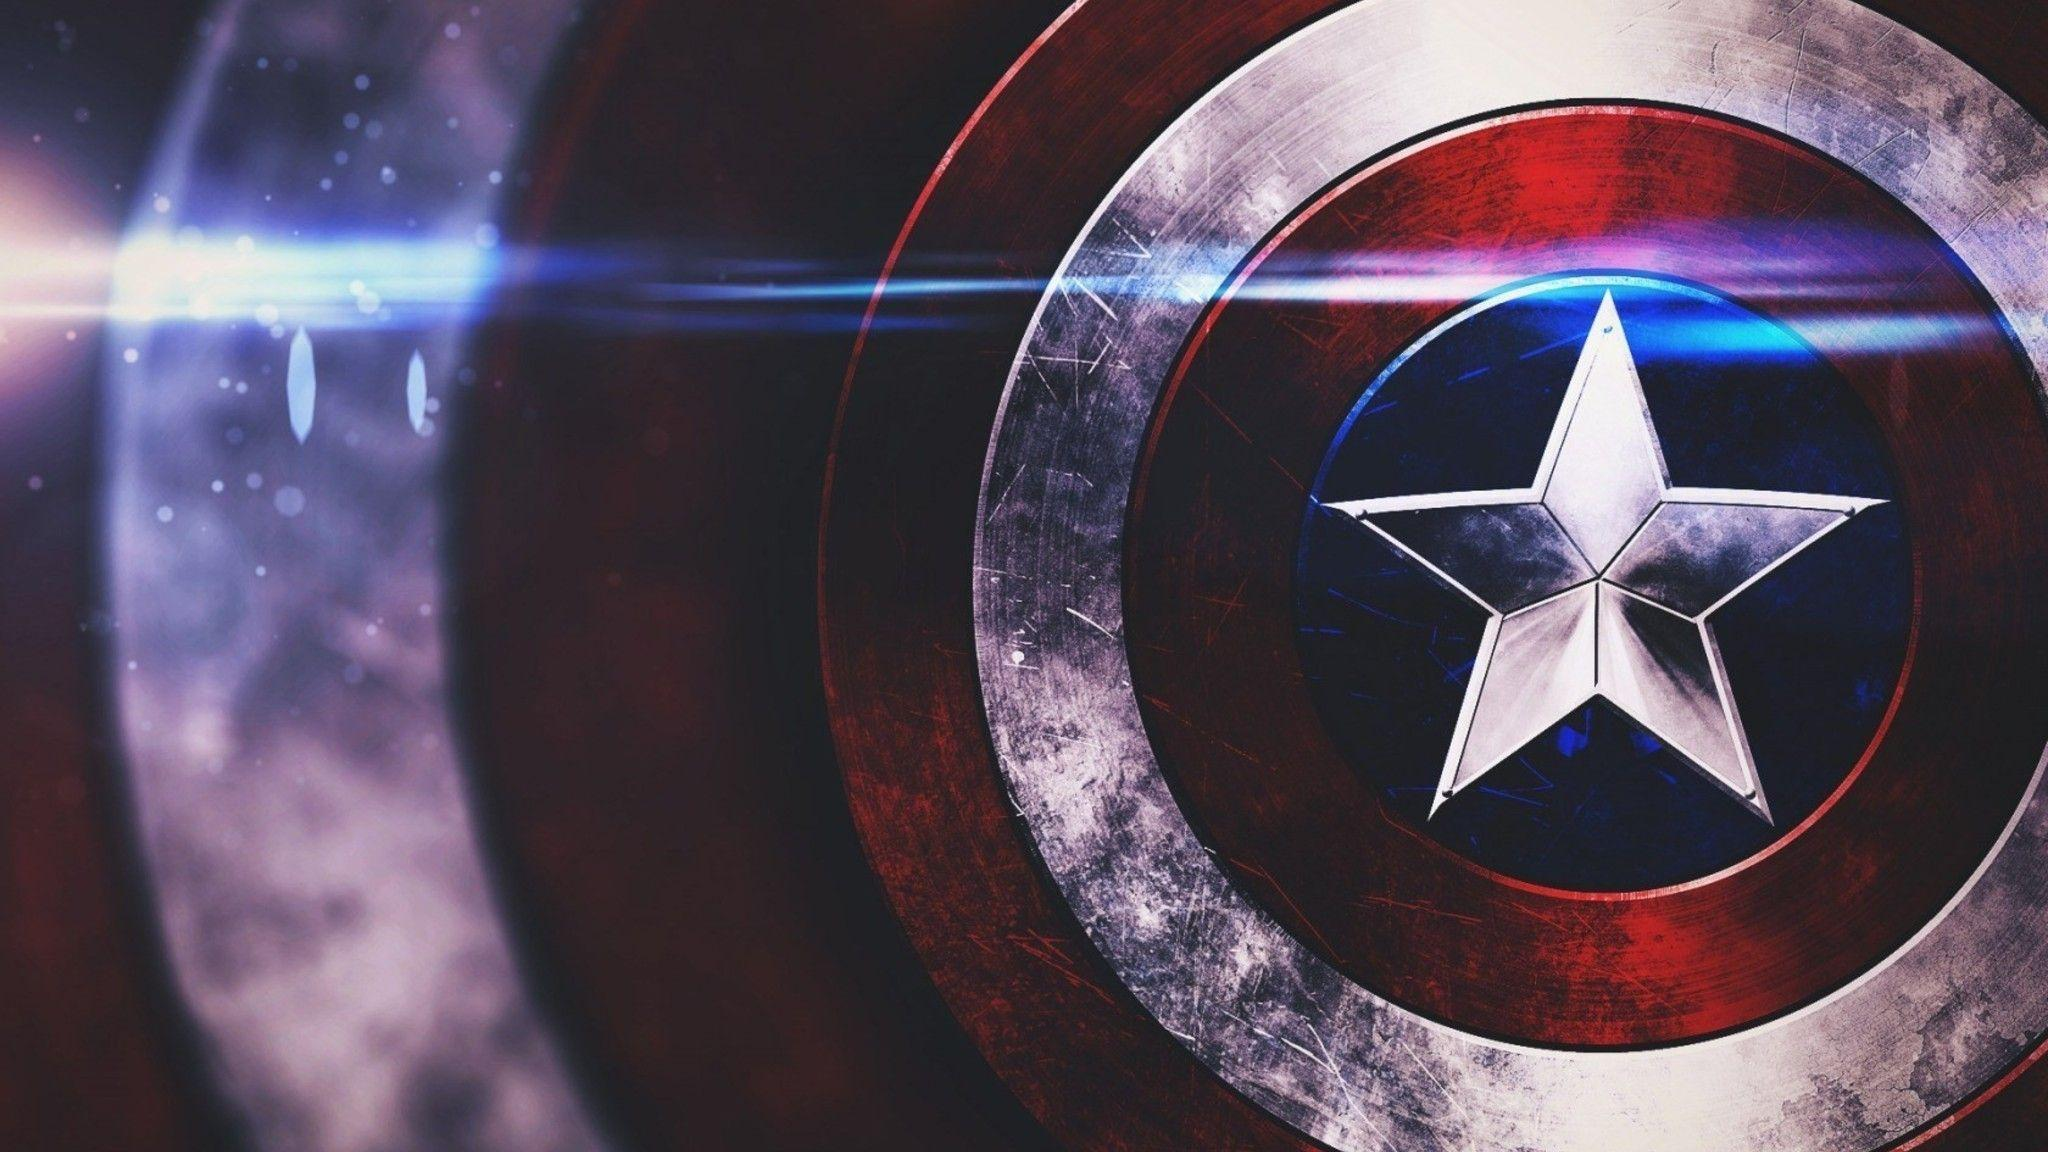 Download Captain America Shield HD Wallpaper In 2048x1152 Screen ...